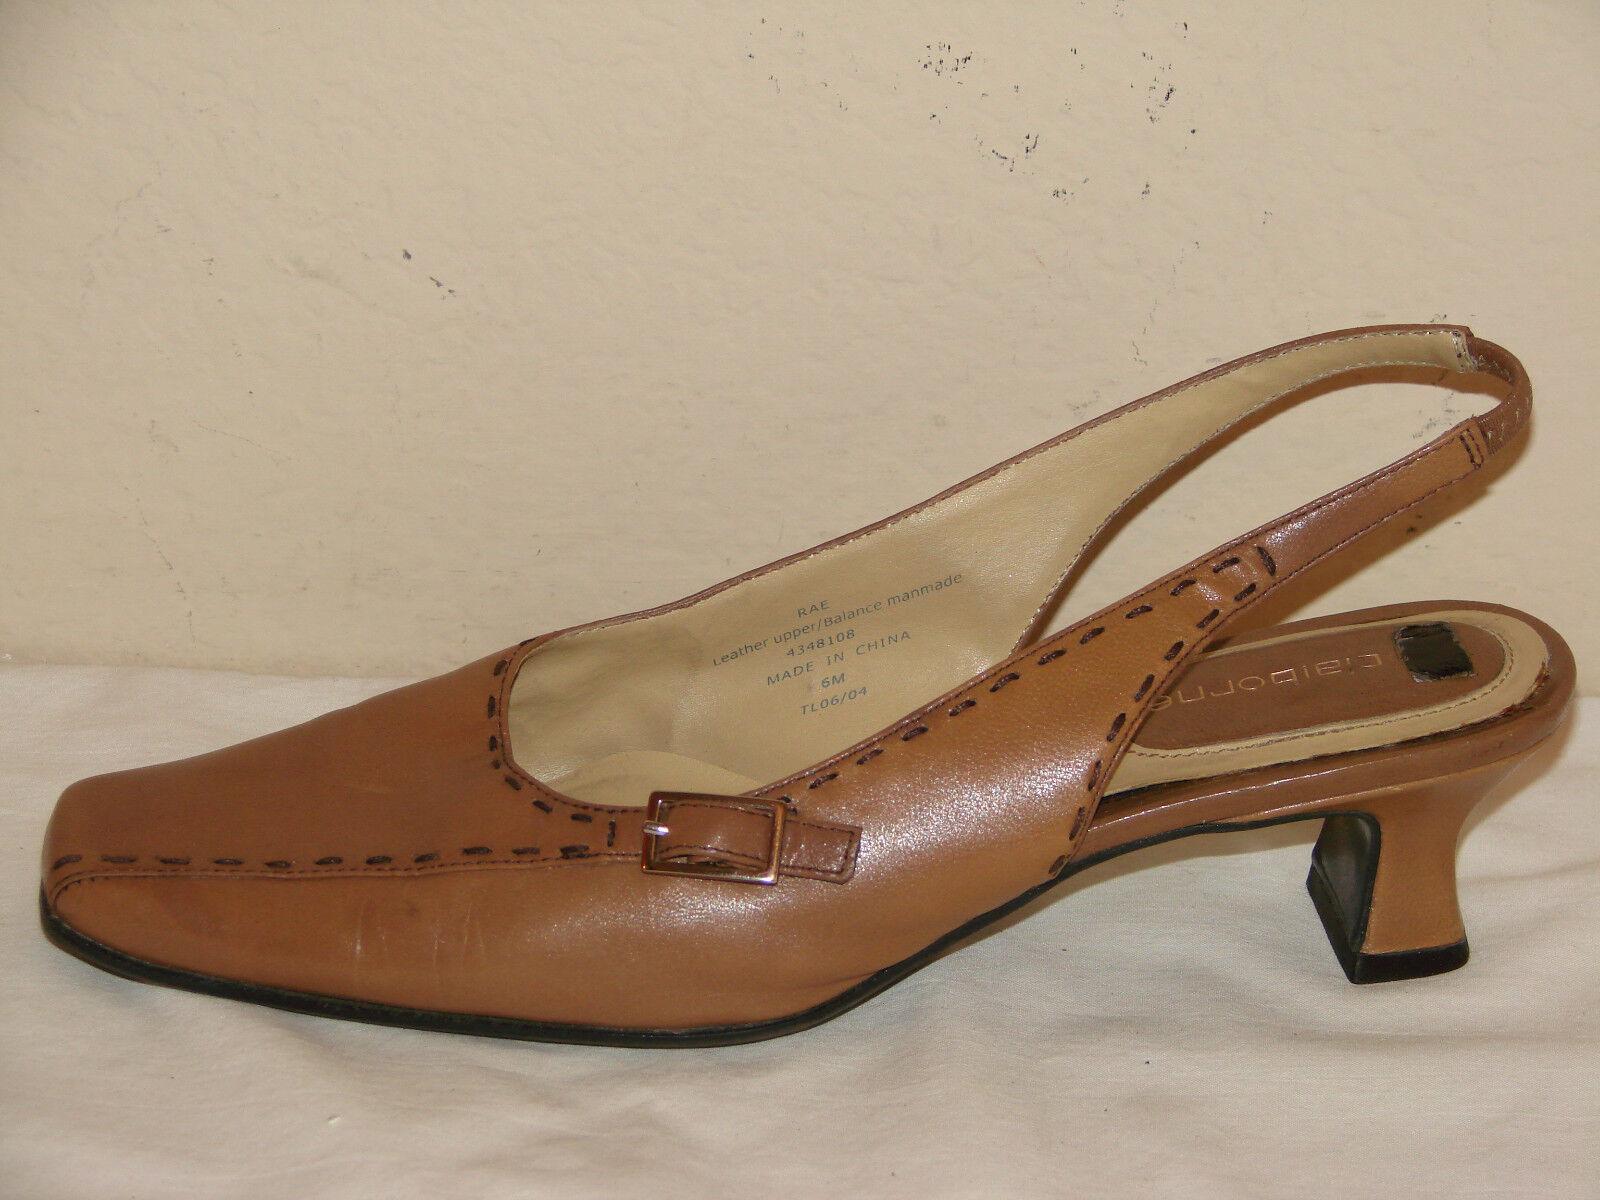 Liz Leather Claiborne Rae Womens Tan Leather Liz Slingback Low Heel Shoe - Size 6M 8d4db0